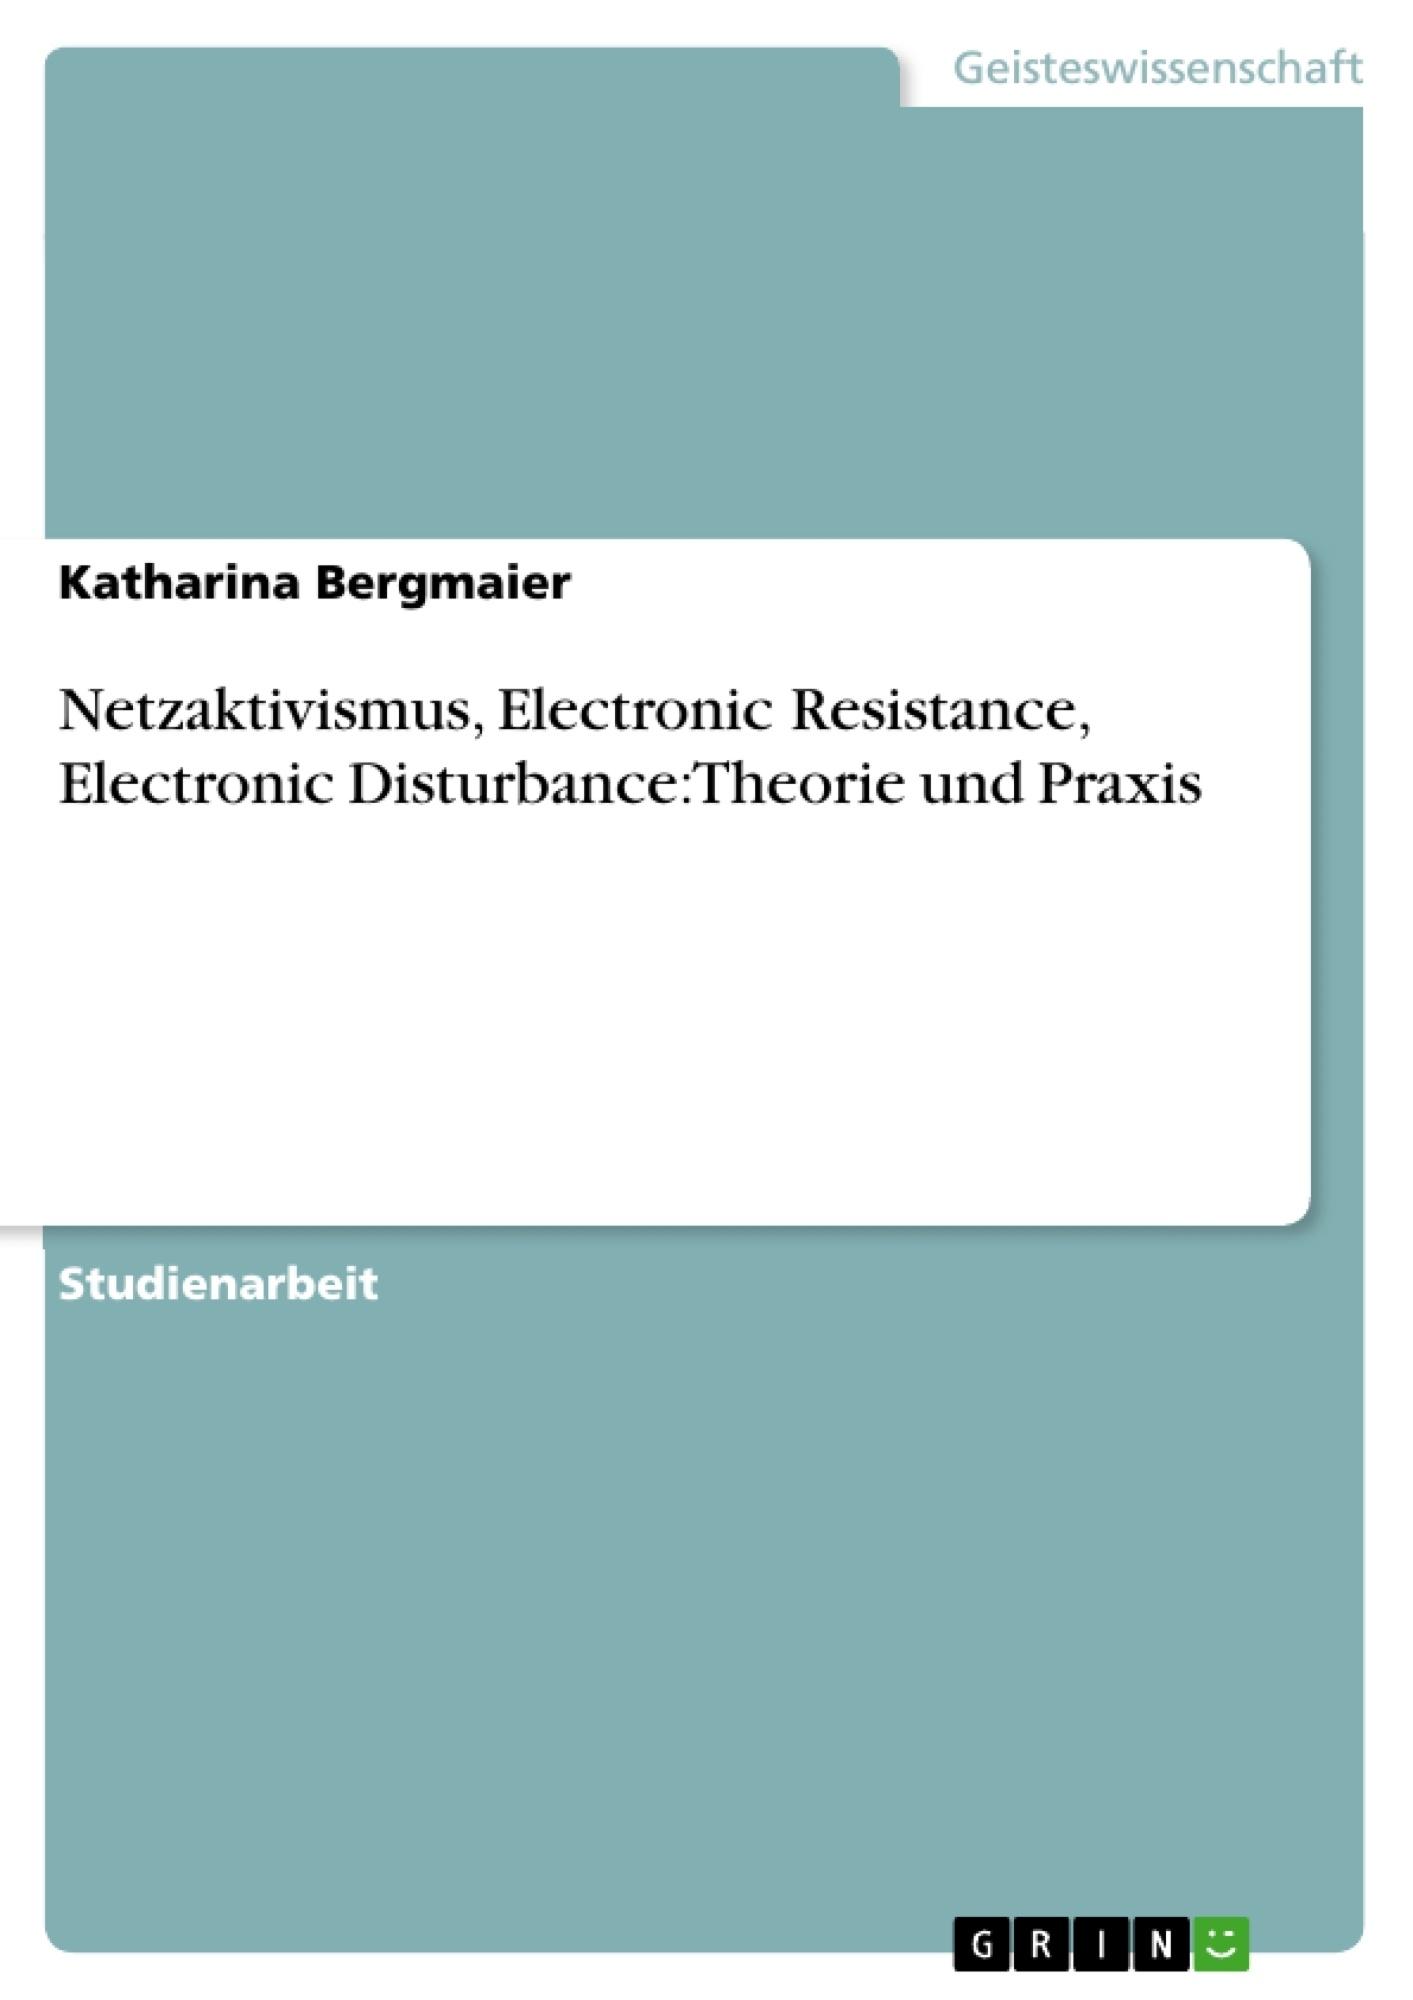 Titel: Netzaktivismus, Electronic Resistance, Electronic Disturbance: Theorie und Praxis